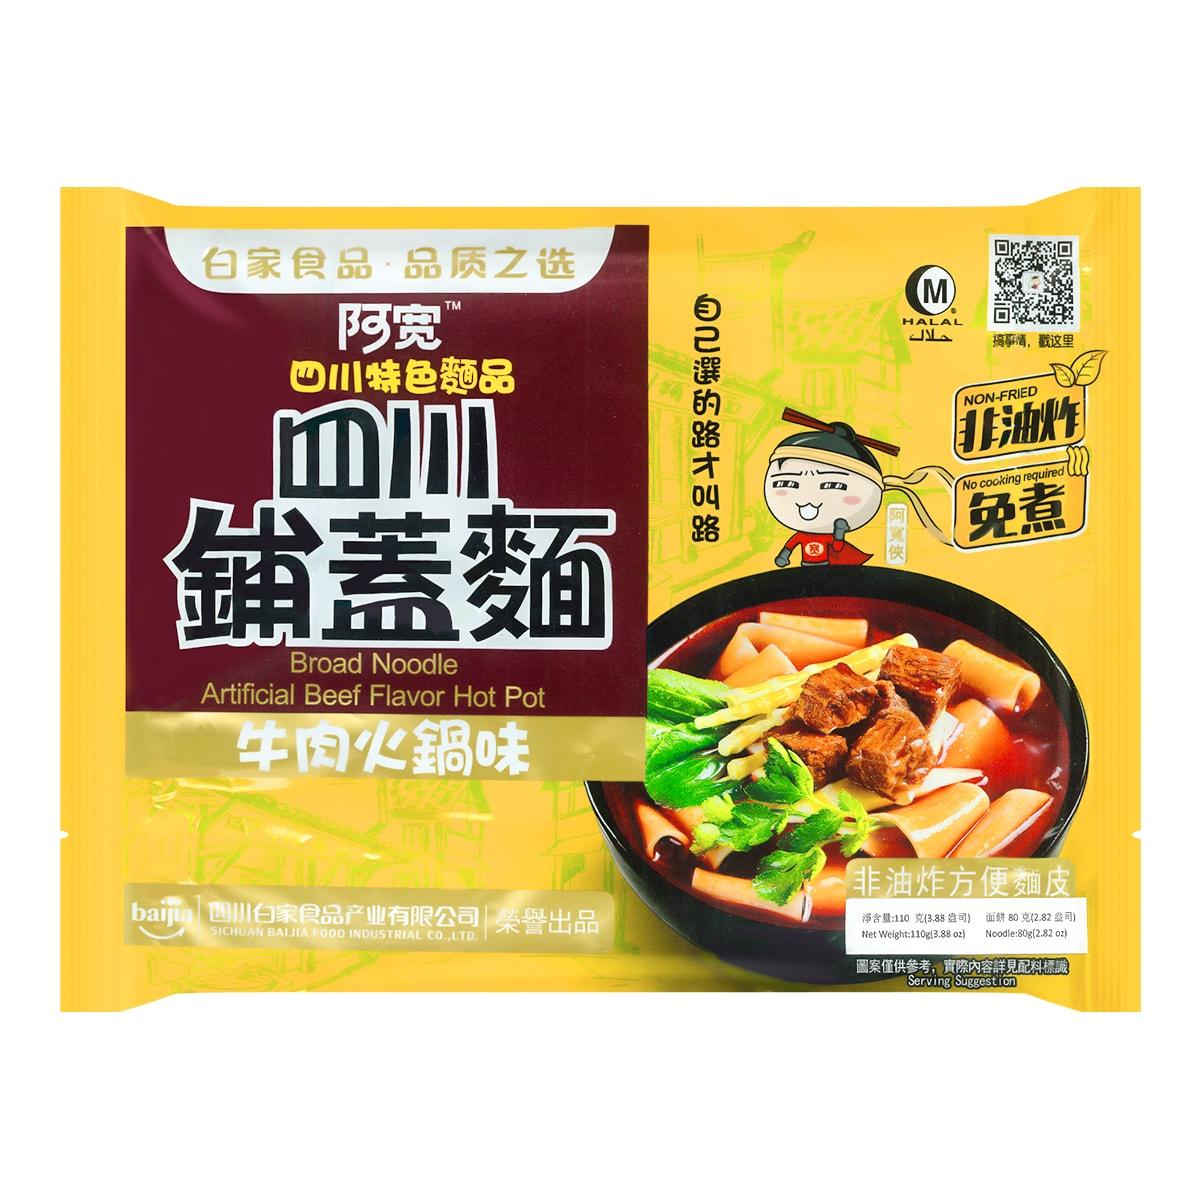 BAIJIA Sichuan Broad Noodle Beef Hot Pot Flavor 110g